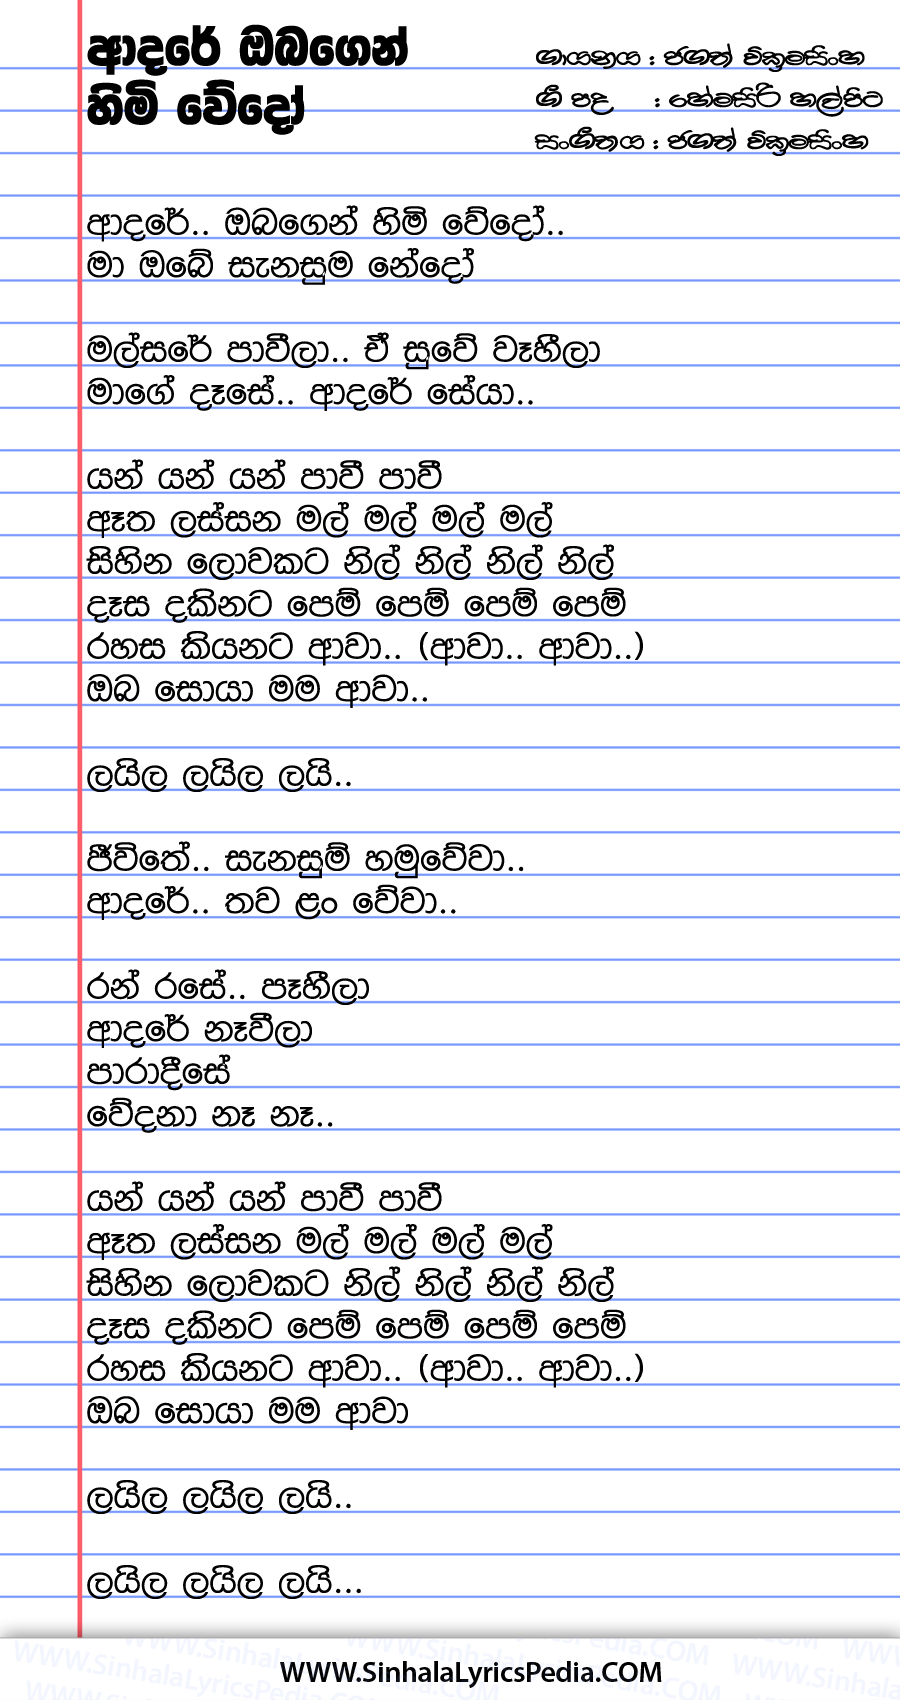 Adare Obagen Himi Wedo Song Lyrics